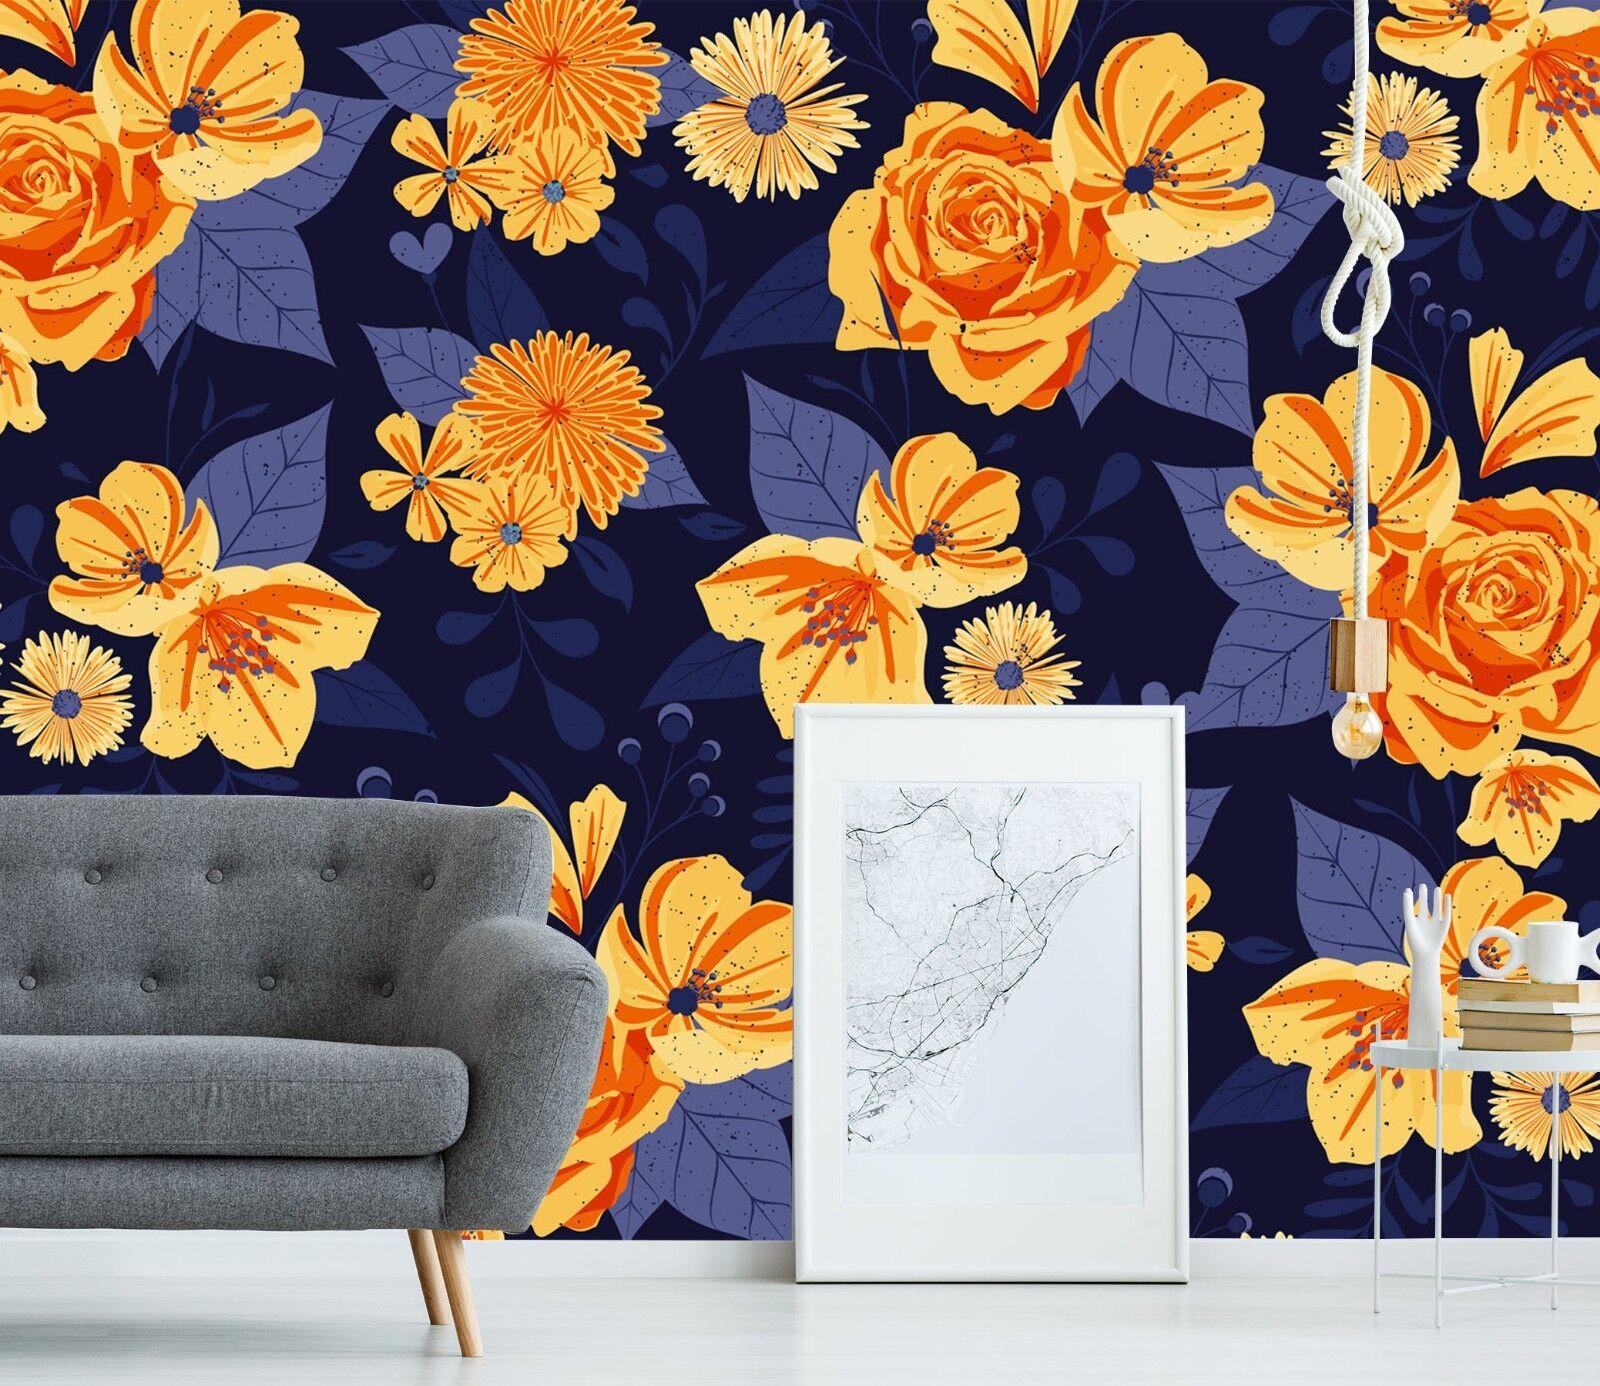 3D Golden Flower 805 Wall Paper Print Wall Decal Deco Indoor Wall Murals US